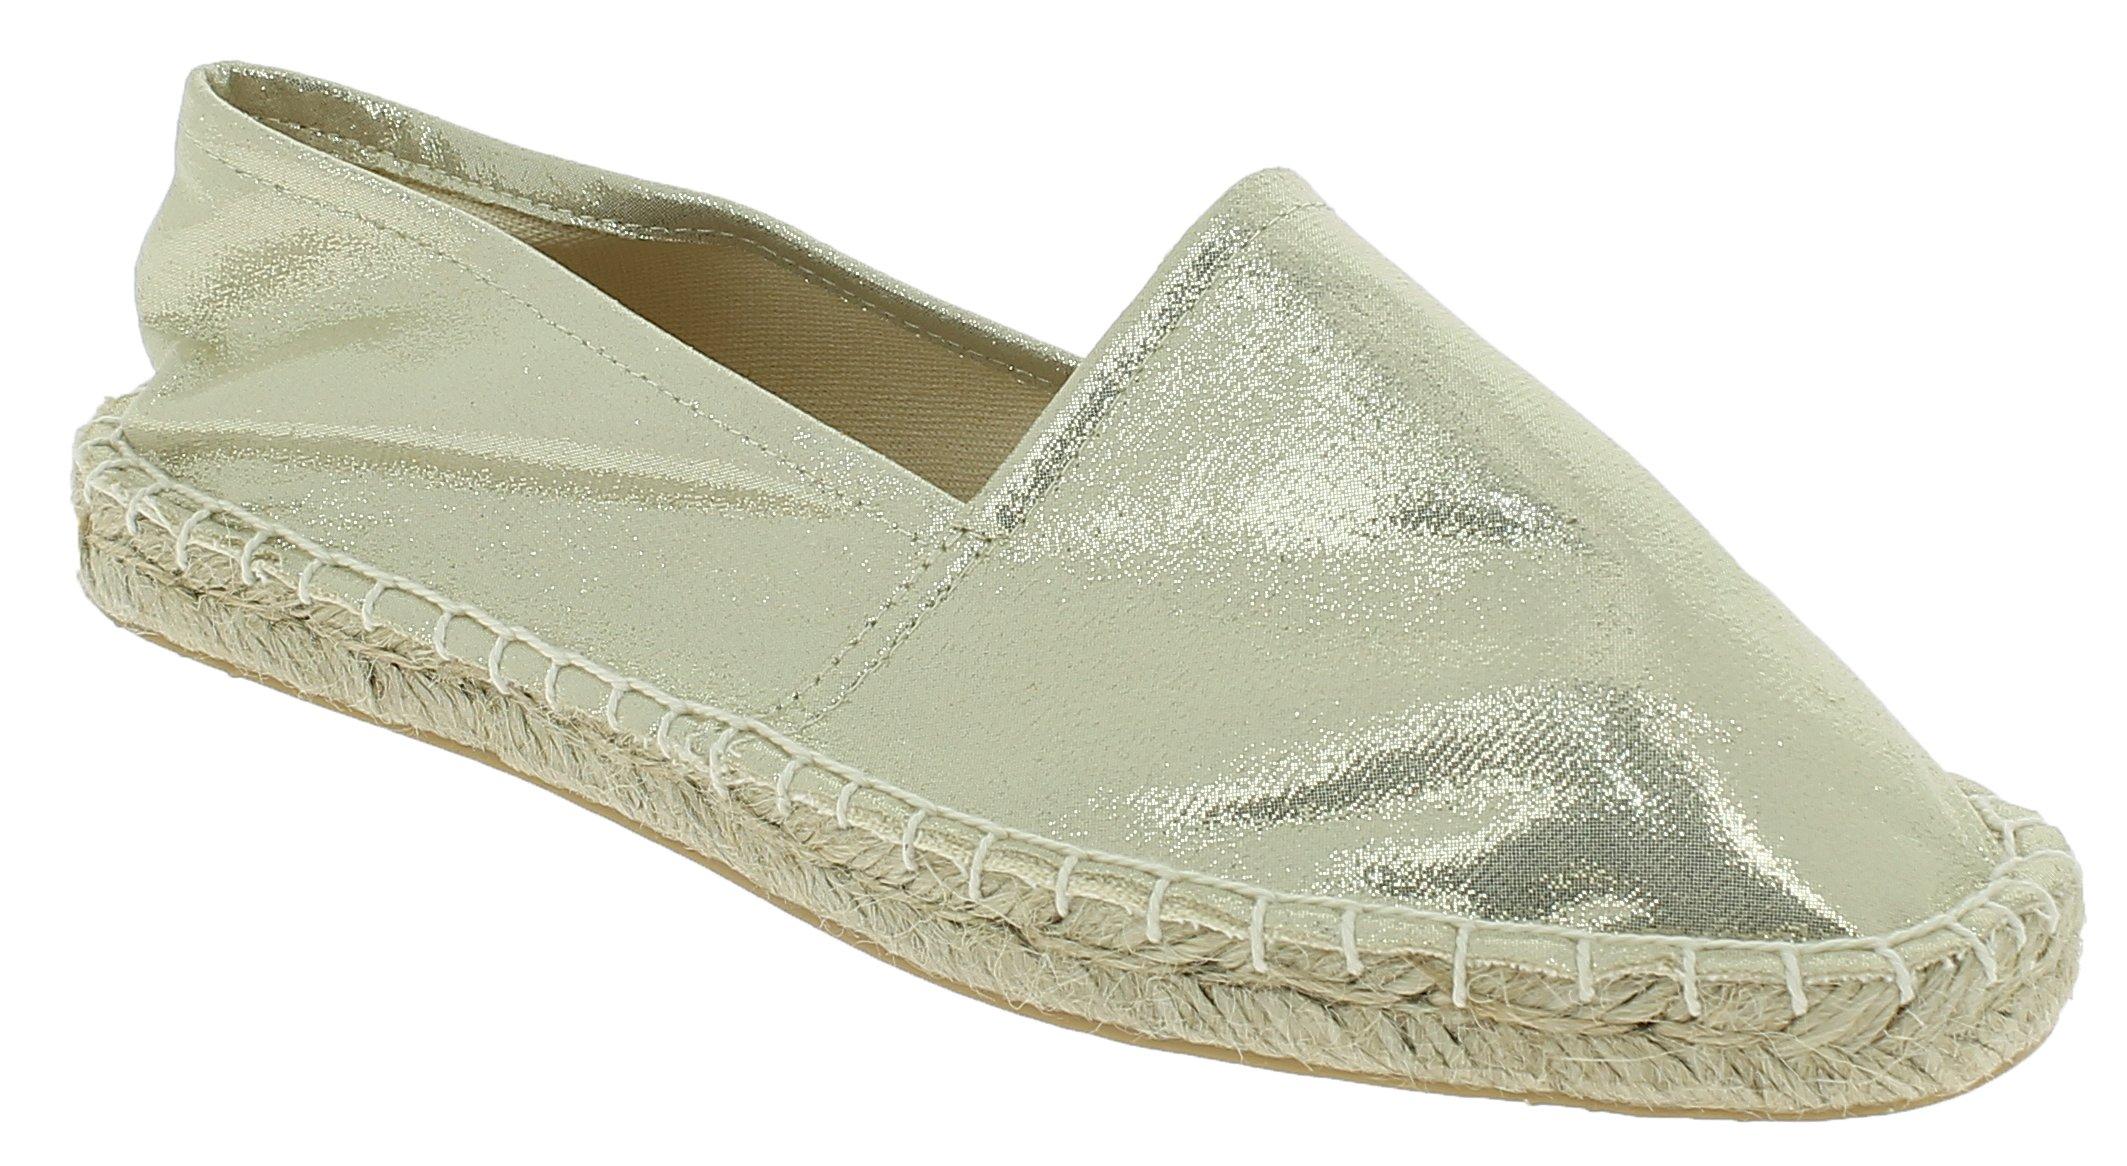 TOPWAY Γυναικείο Casual B702321 Χρυσό - IqShoes - B702321 gold 37/1/34/27 παπούτσια  προσφορεσ